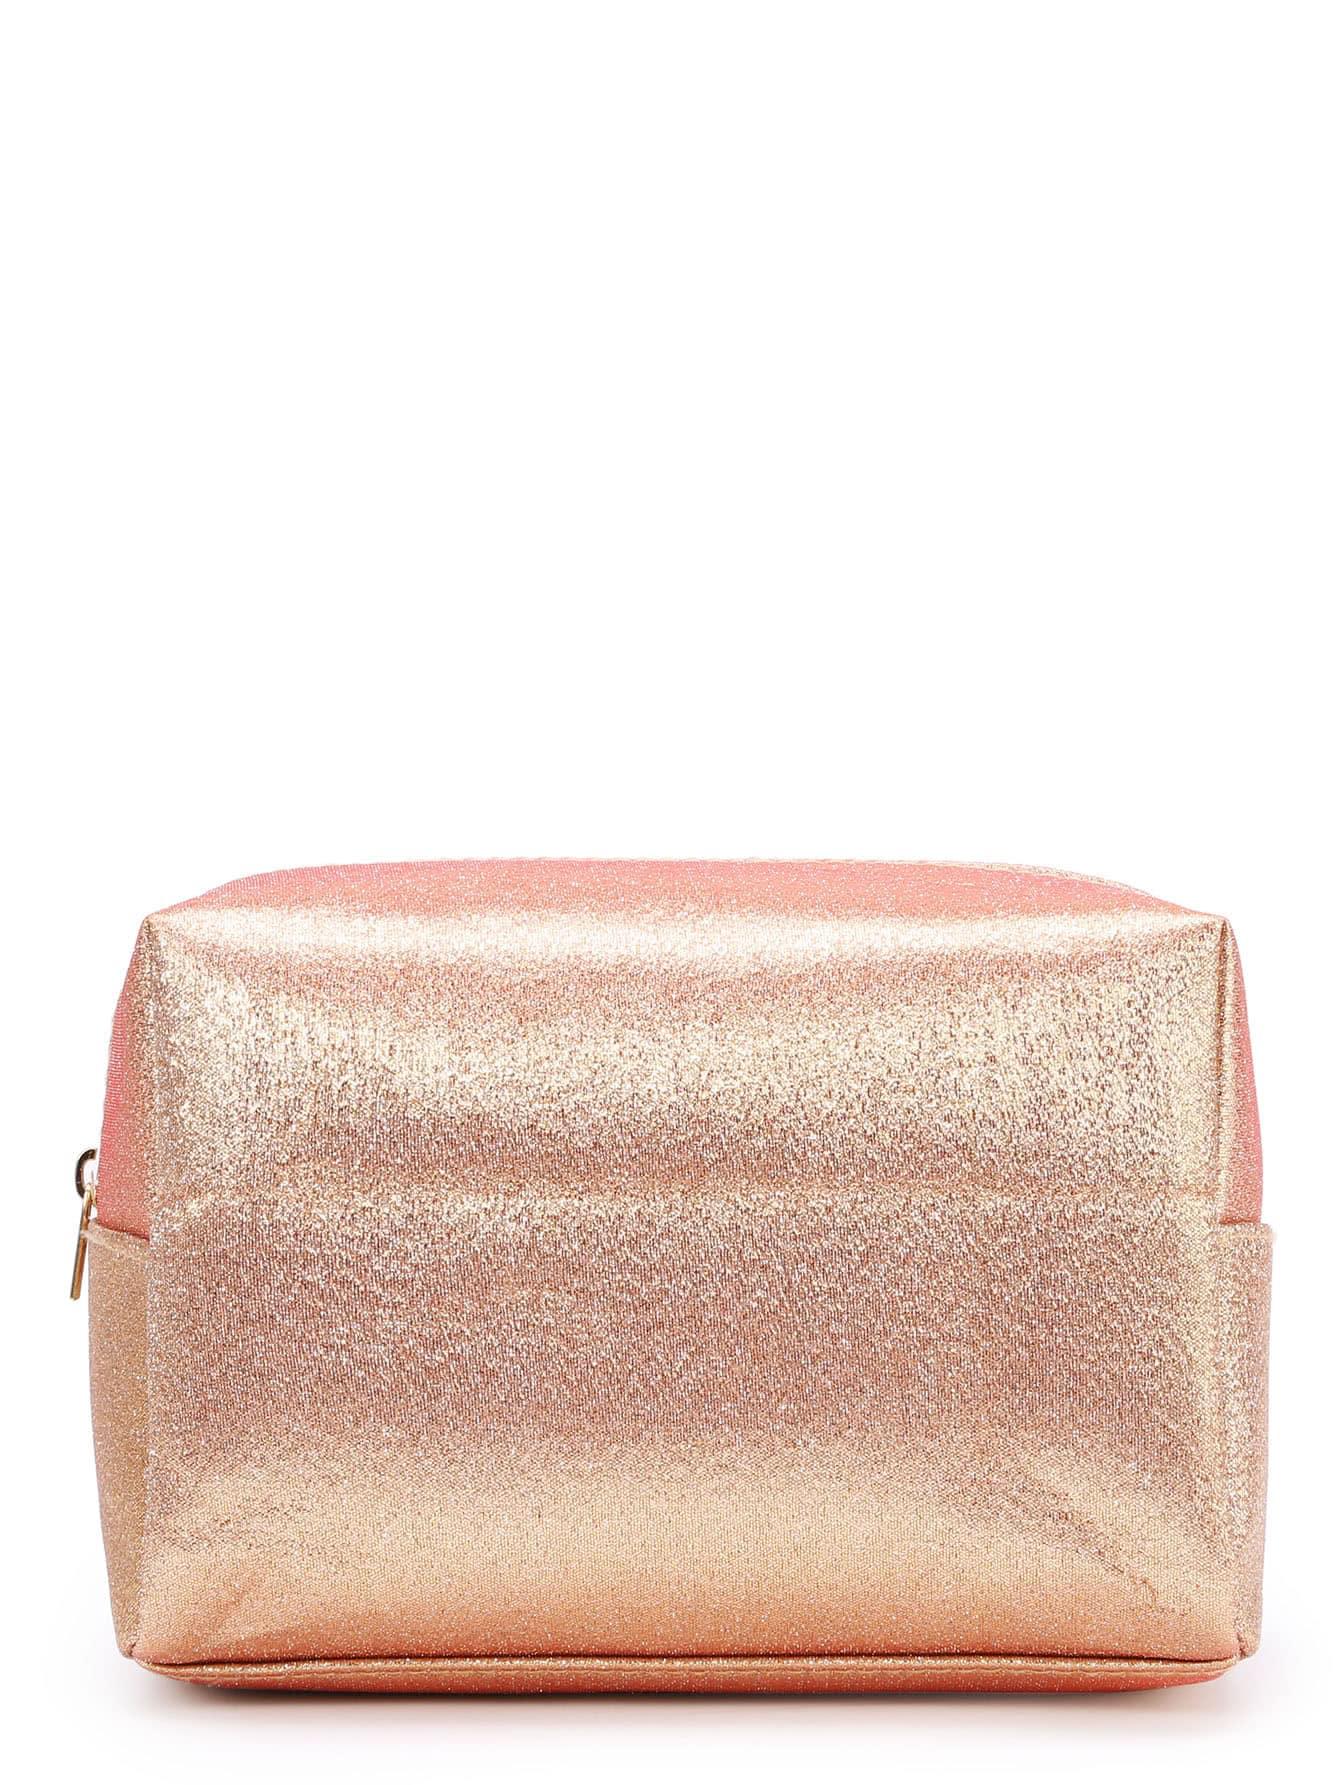 Фото Zipper Glitter Cosmetic Bag makeup organizer travel bag women cosmetic bags summer dumpling clutch women packages waterproof cosmetic bag handbag